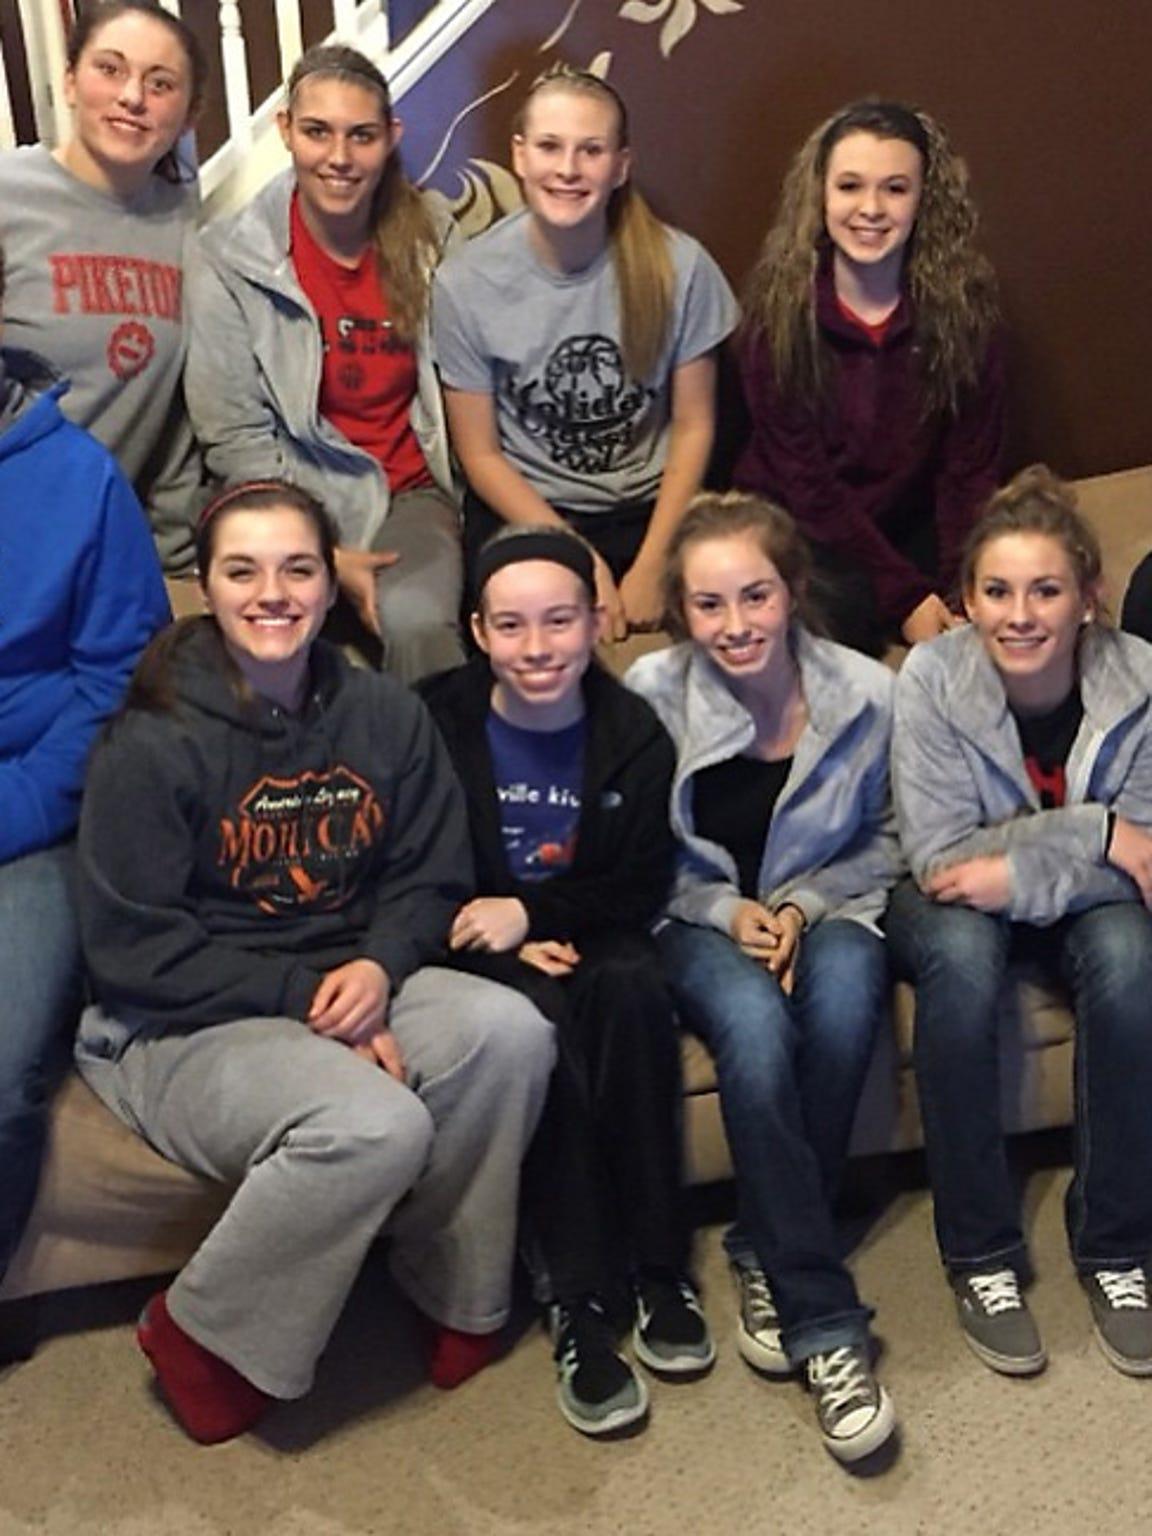 The Piketon girls' basketball team surprised Payton